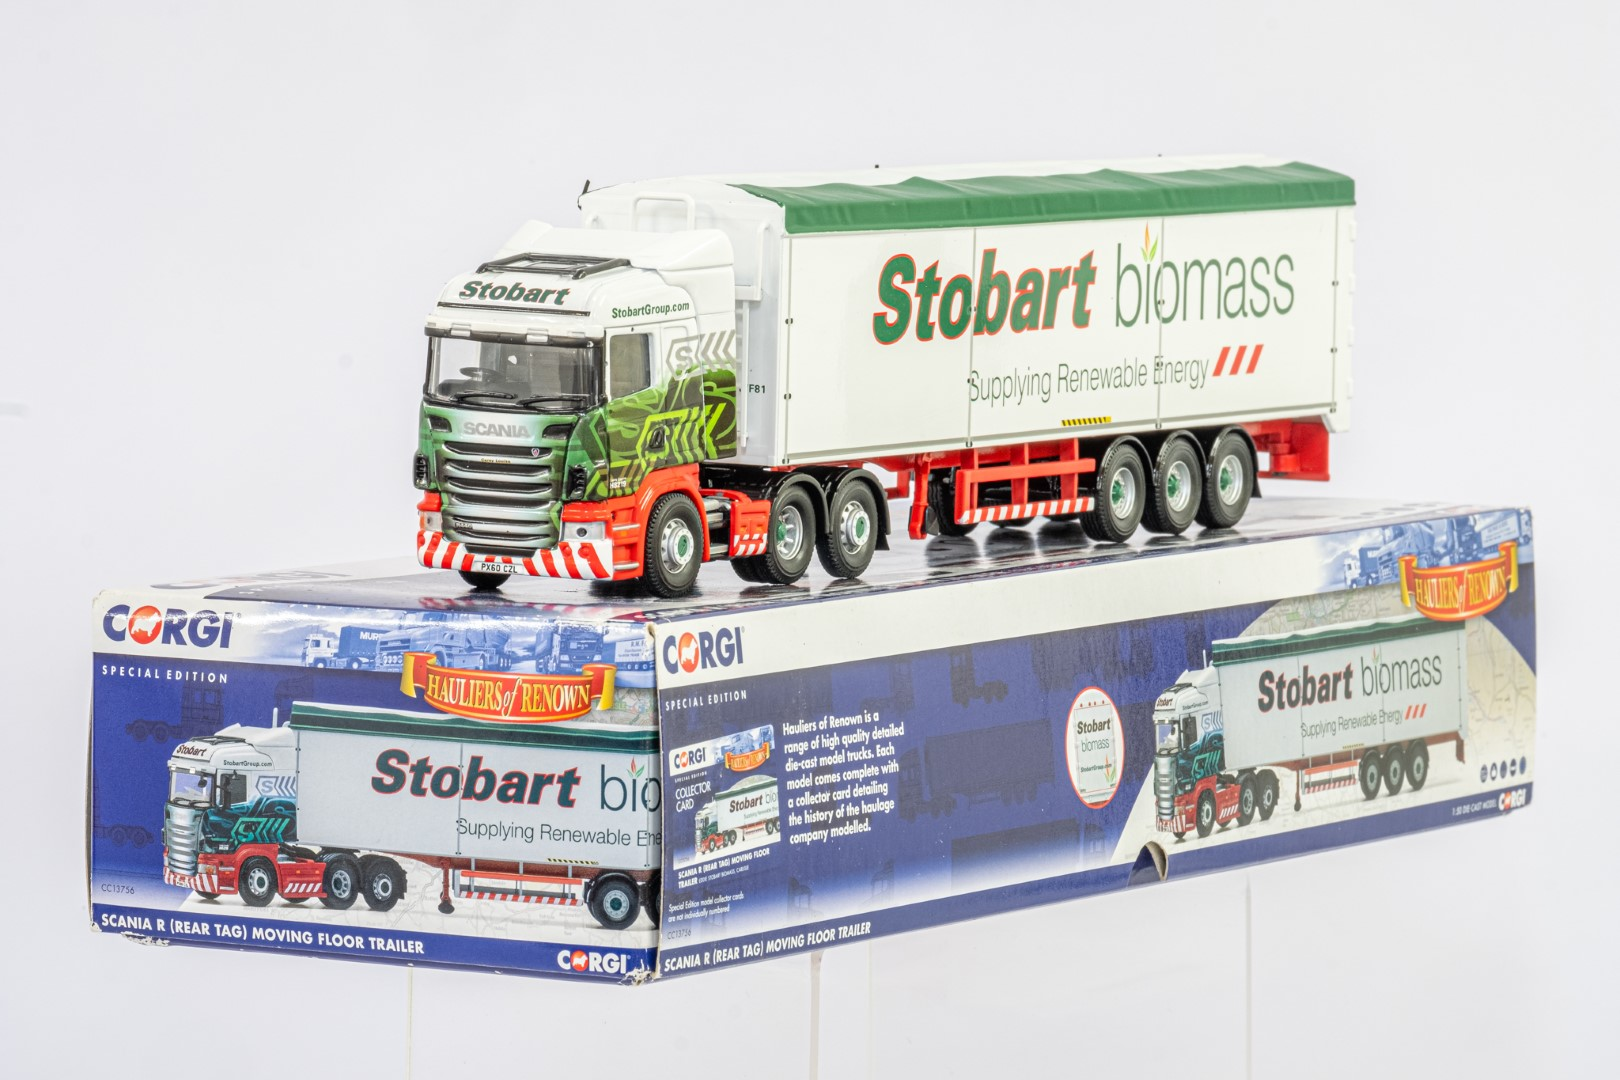 Corgi Scania R Moving Floor Trailer - Eddie Stobart Biomass - - Image 2 of 3